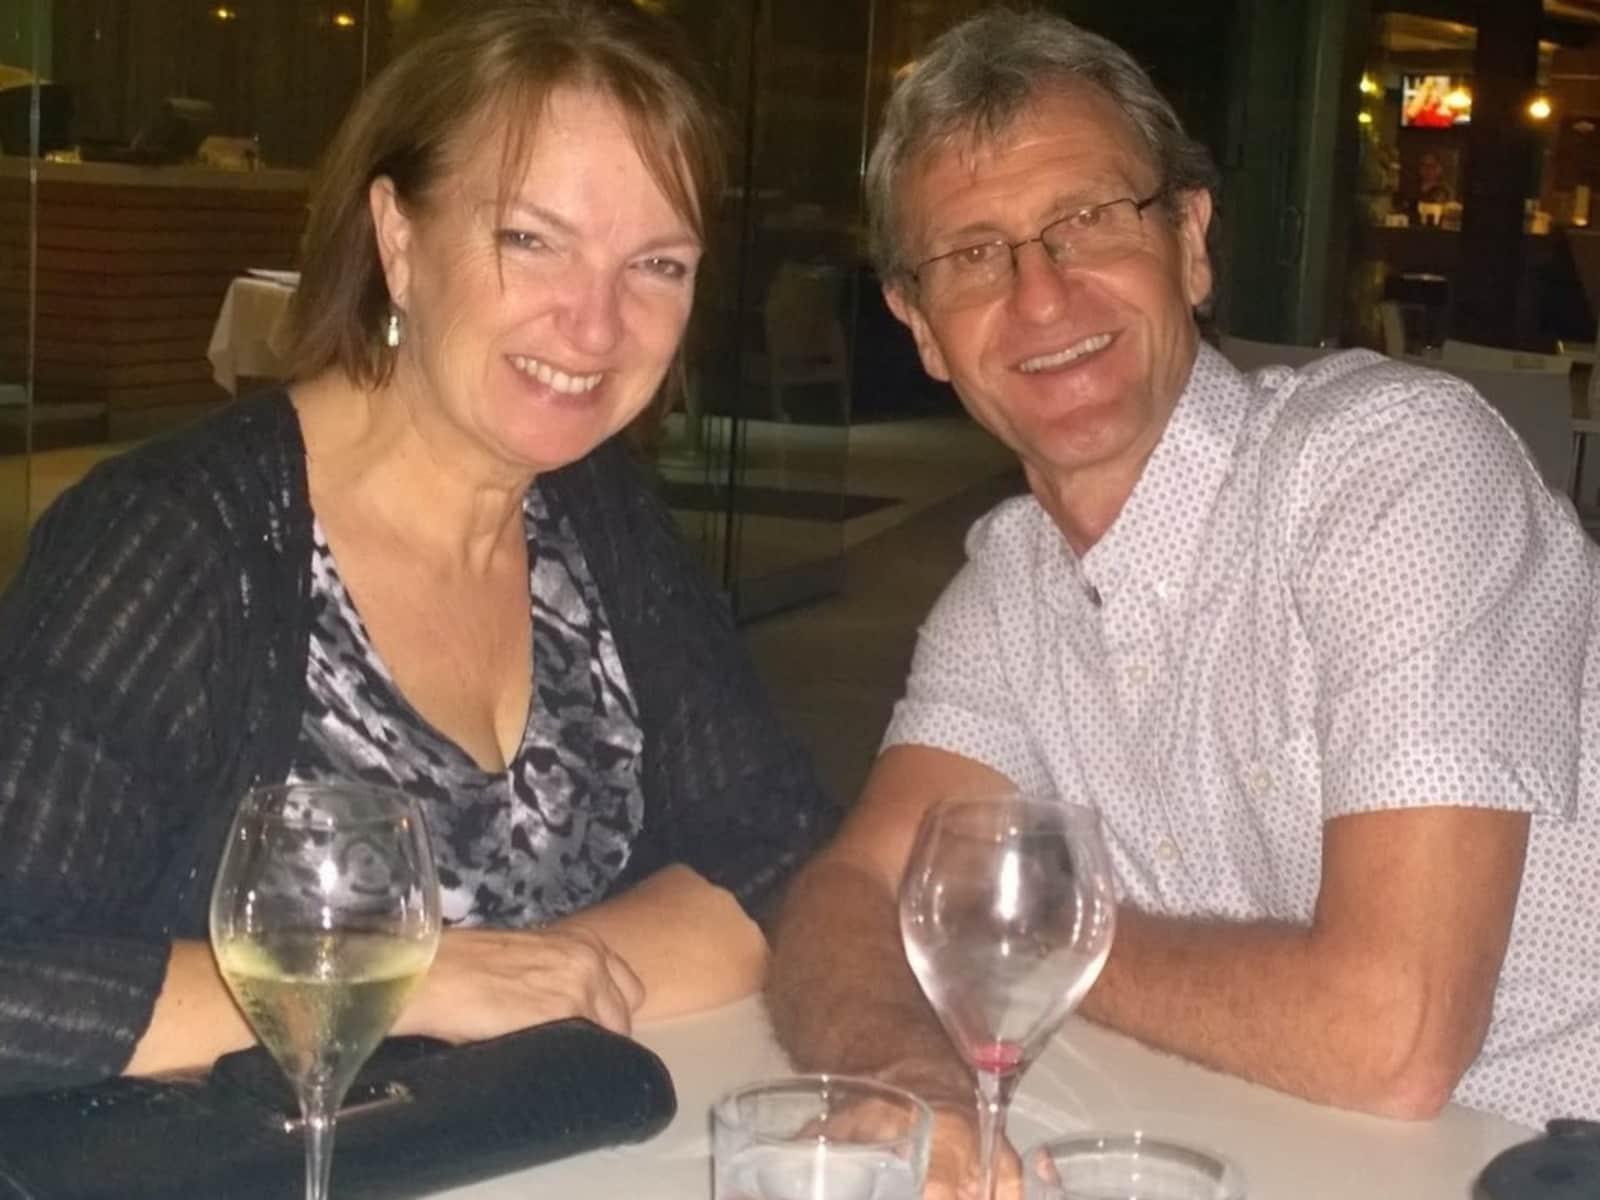 Ross & Susie from Townsville, Queensland, Australia